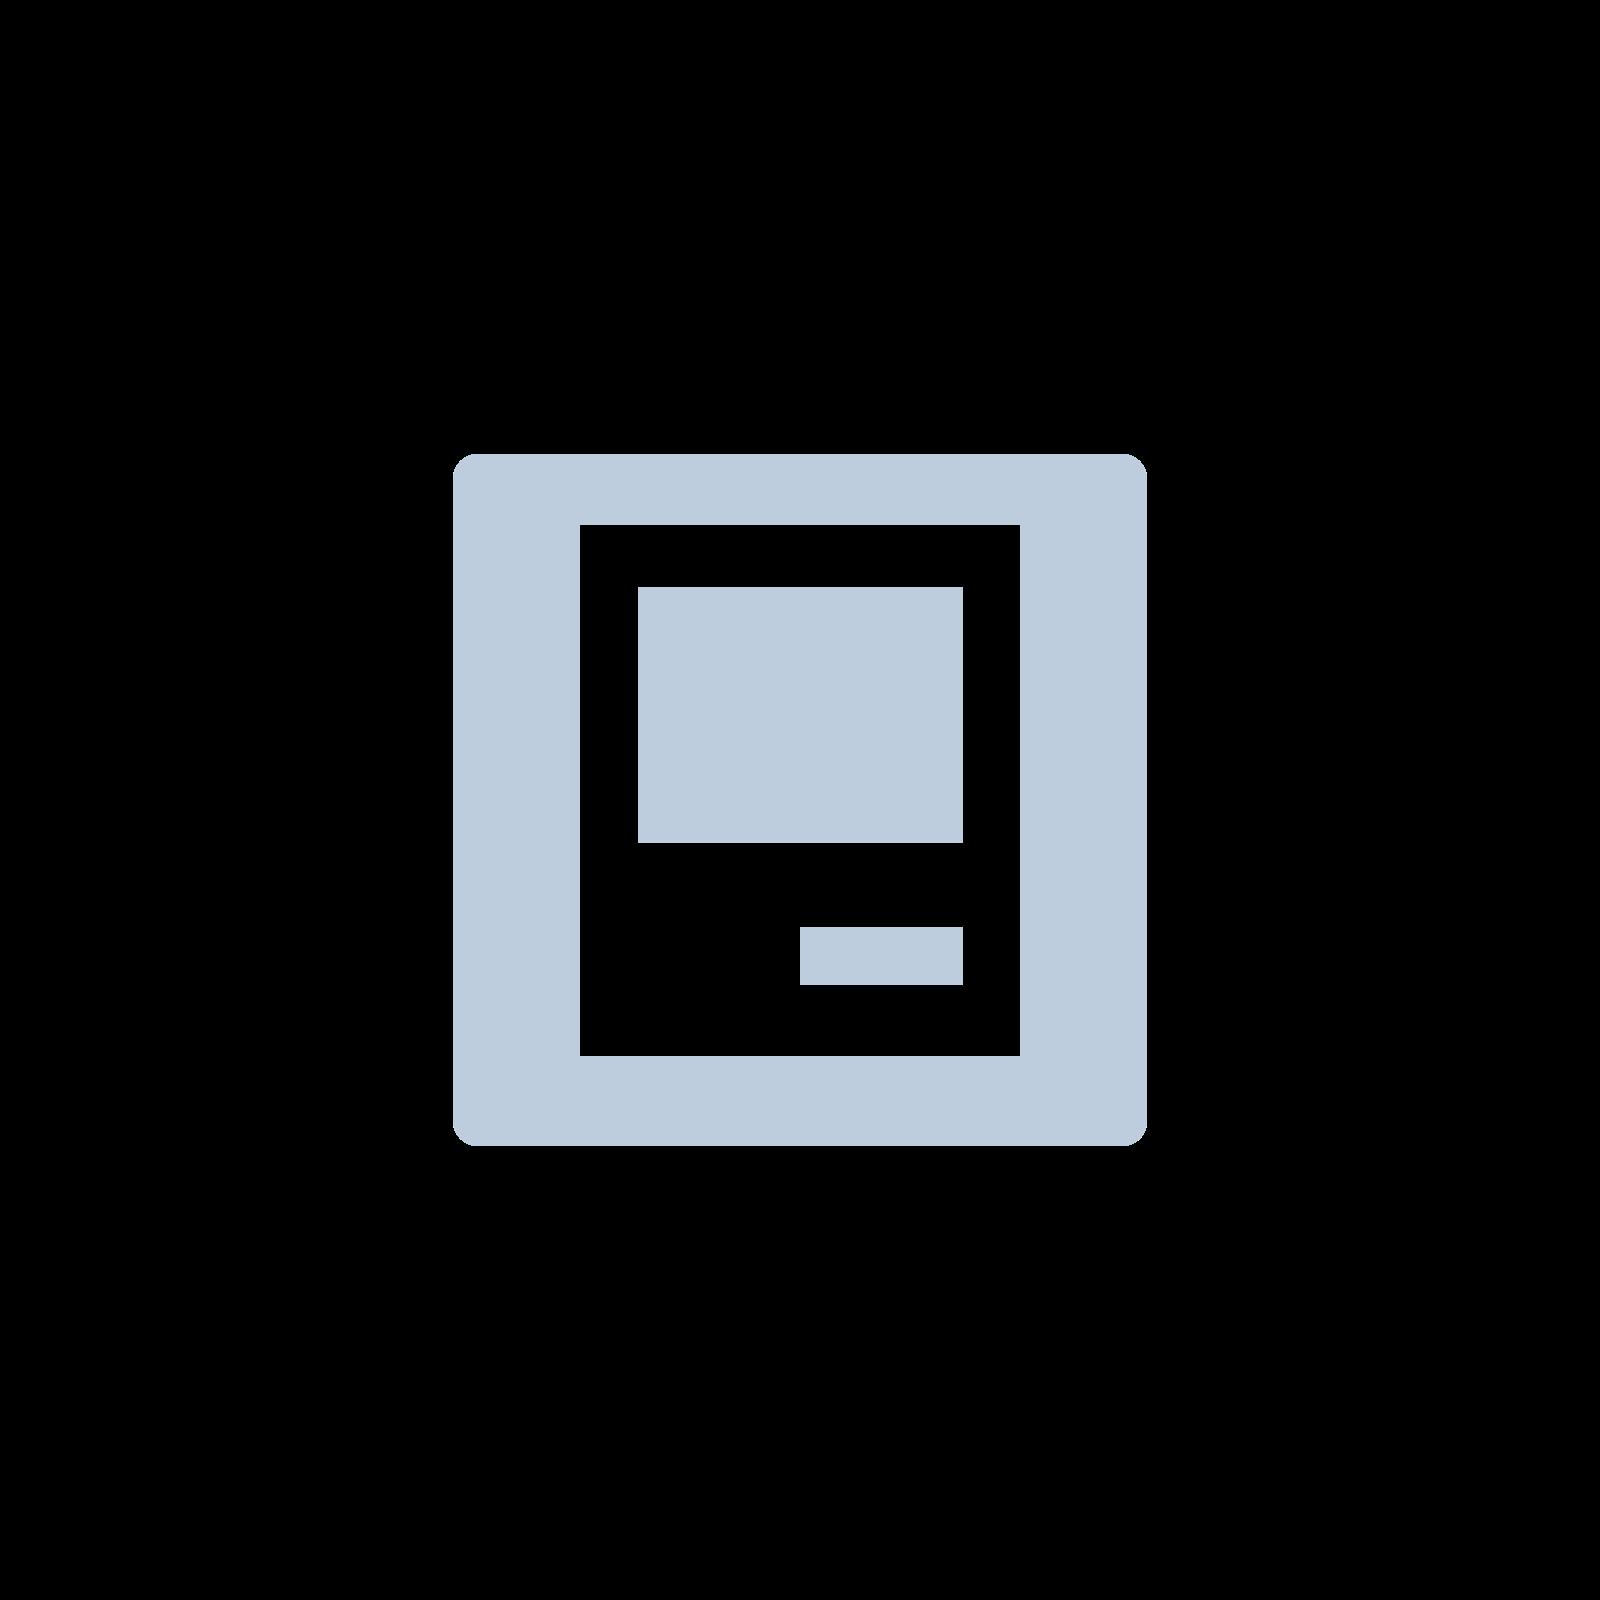 Mac mini Intel Core 2 Duo 1.83GHz (Macmini2,1, 80GB, 1GB RAM)